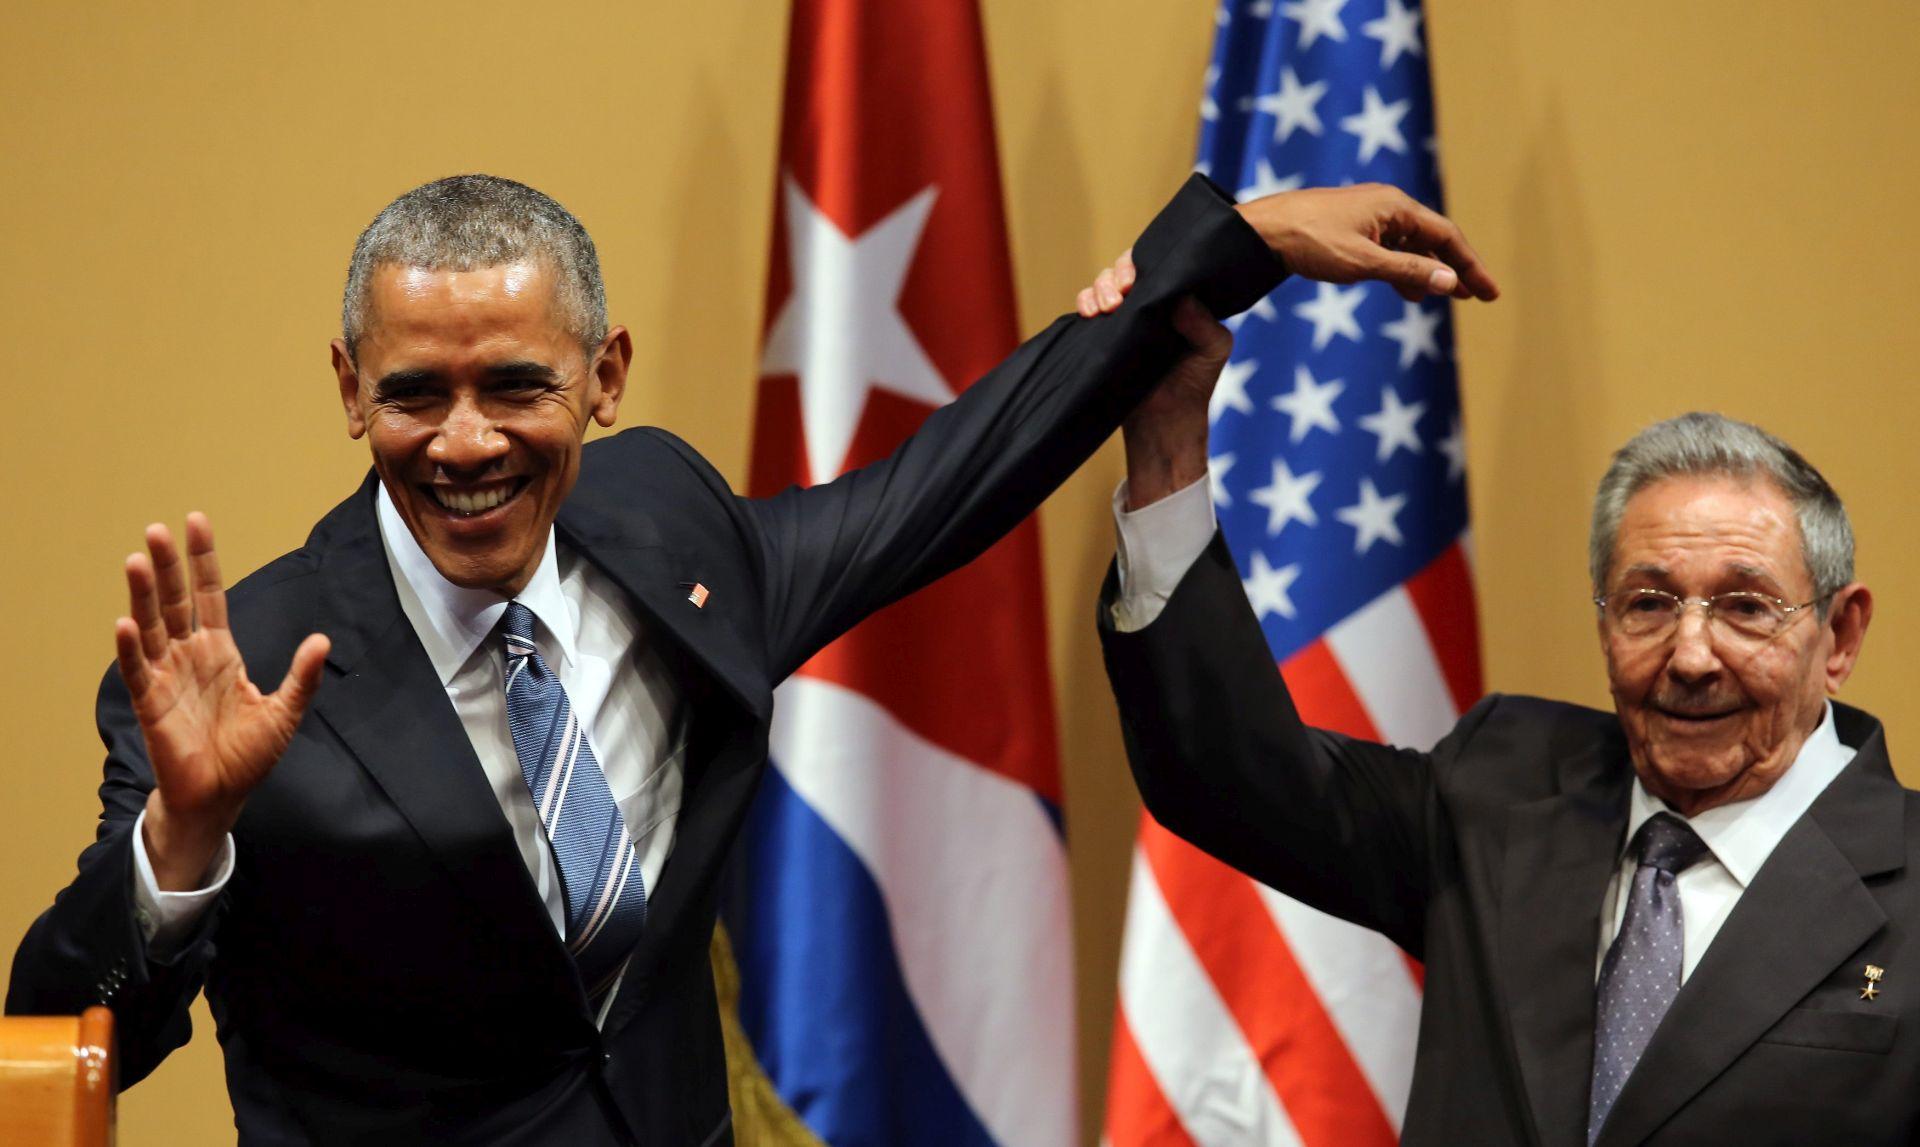 Obama i Castro različito o ljudskim pravima na Kubi